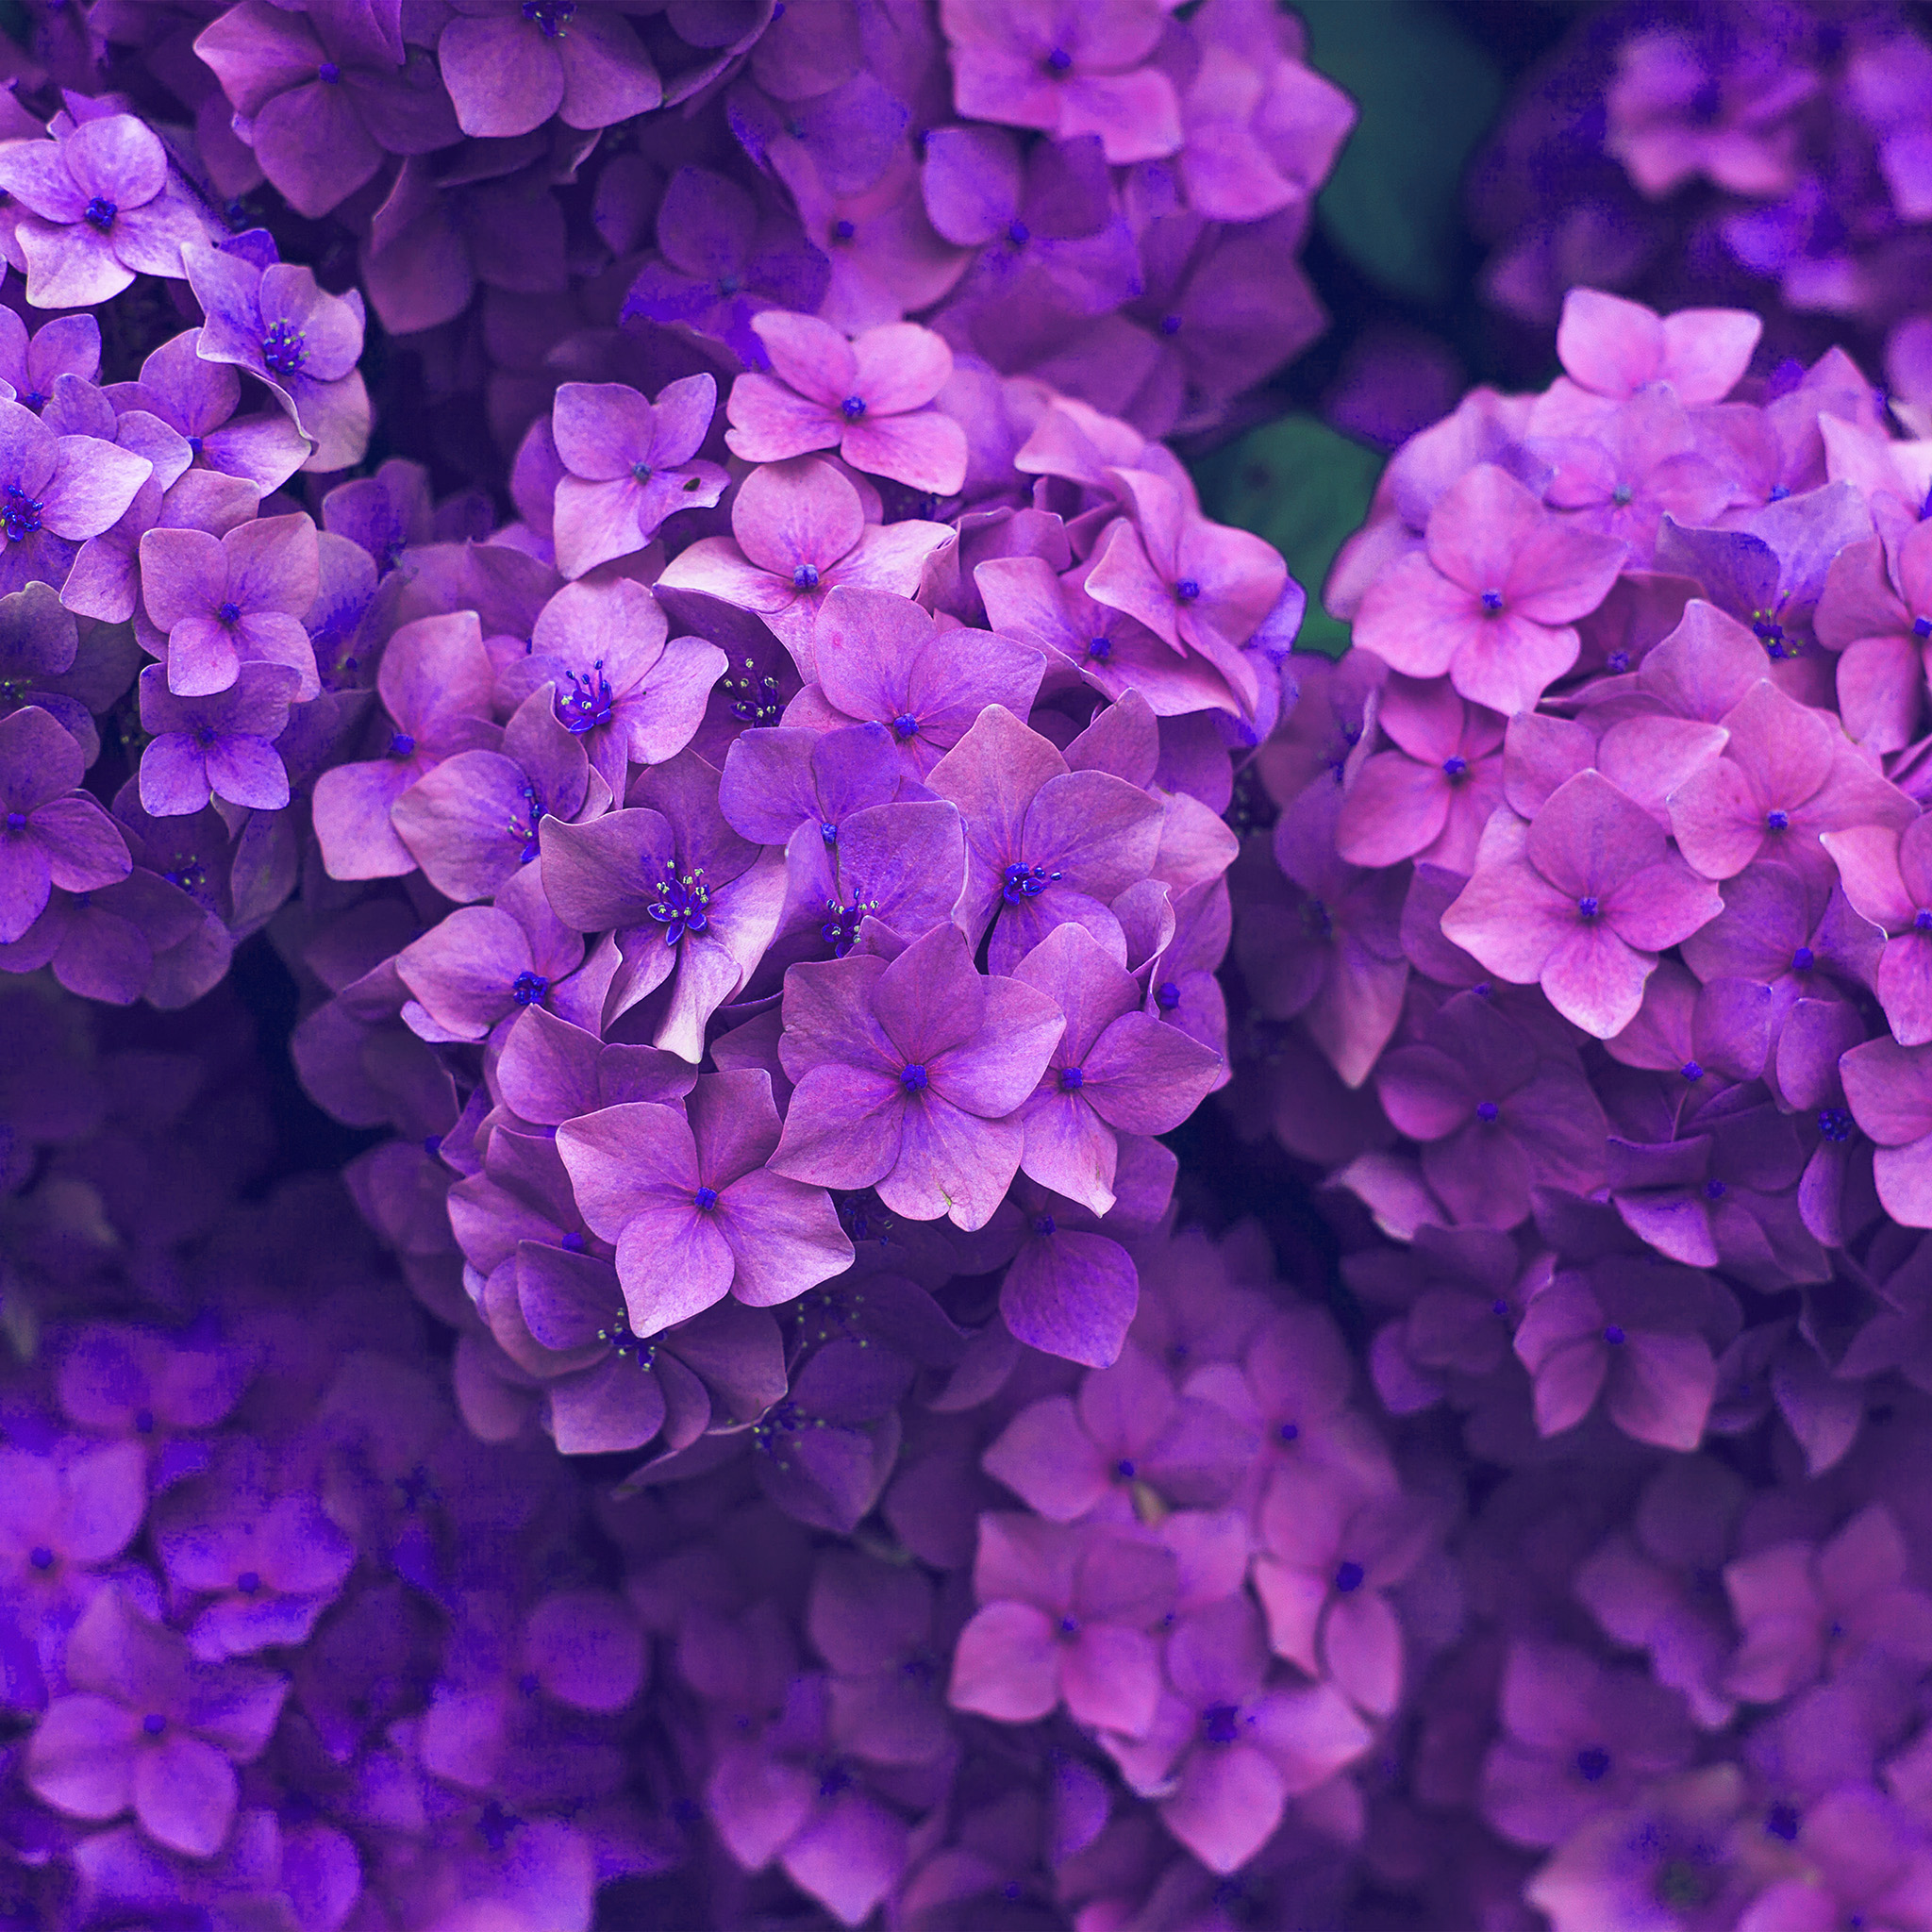 nr09-flower-spring-pink-purple-nature-wallpaper